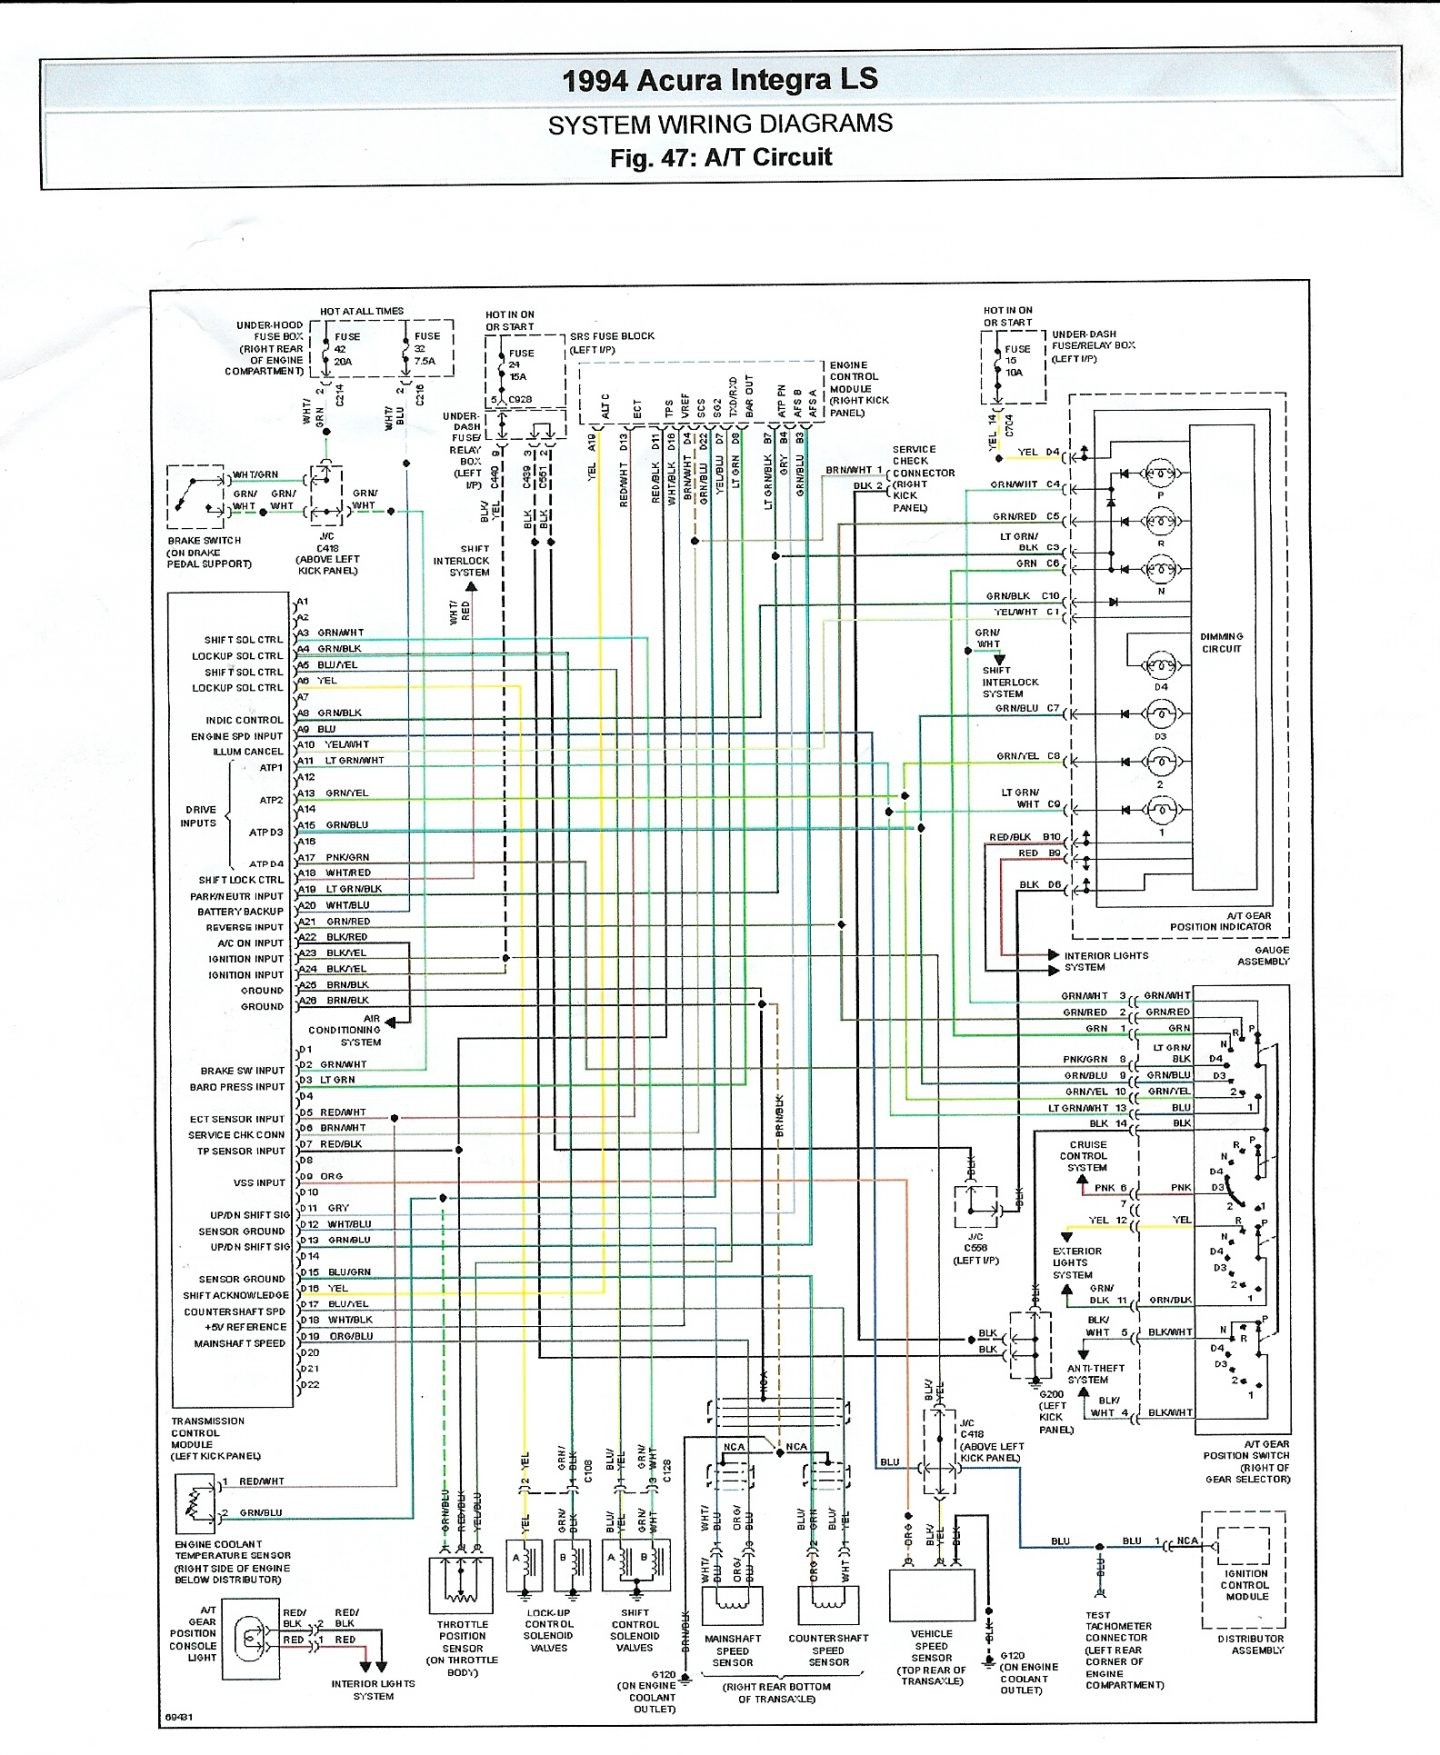 95 Honda Civic Engine Diagram Vw Transporter Wiring Diagram 95 Honda Civic Transmission Diagram Of 95 Honda Civic Engine Diagram